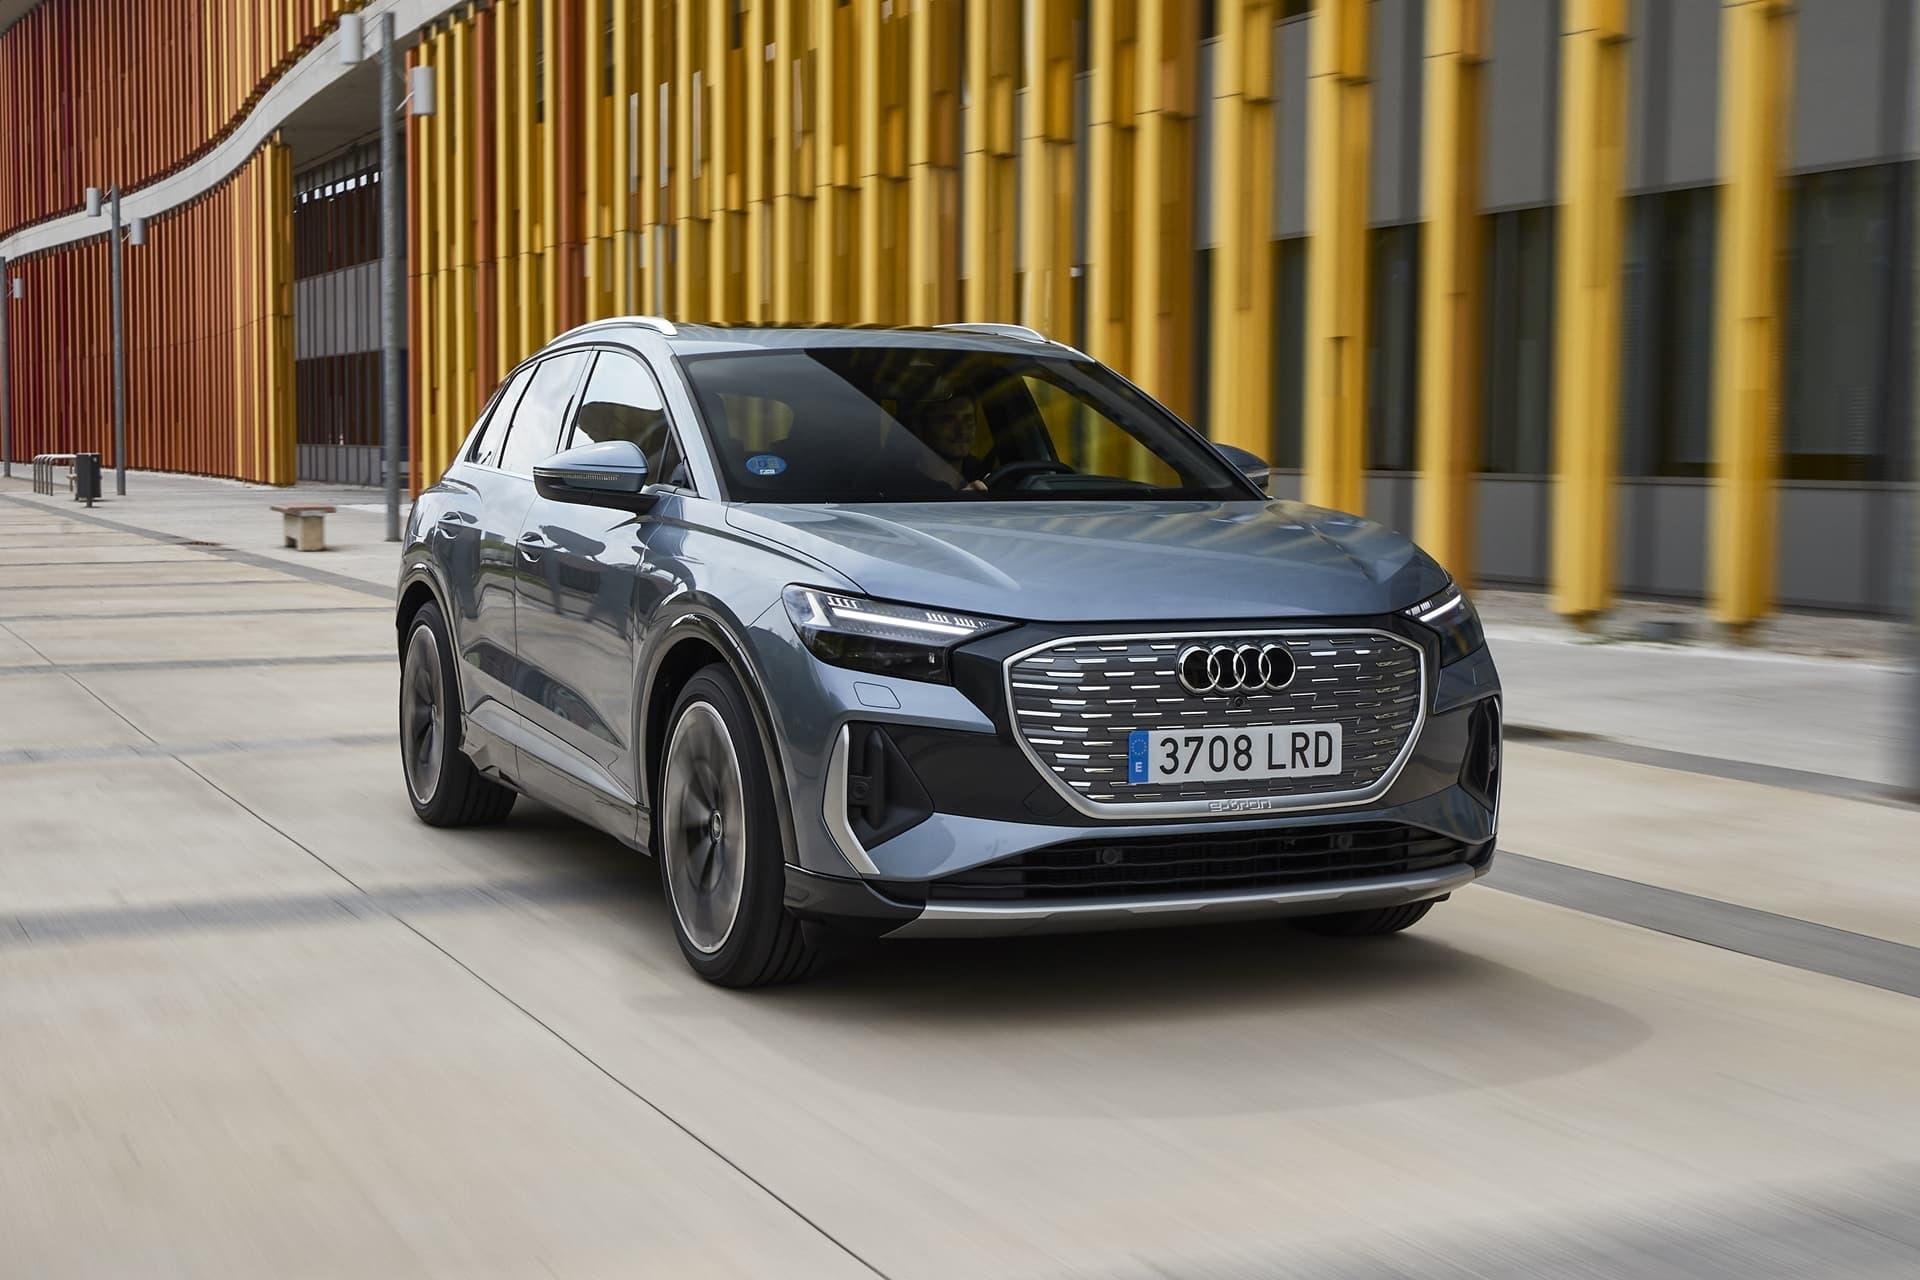 Audi Q4 E Tron 2021 0721 017